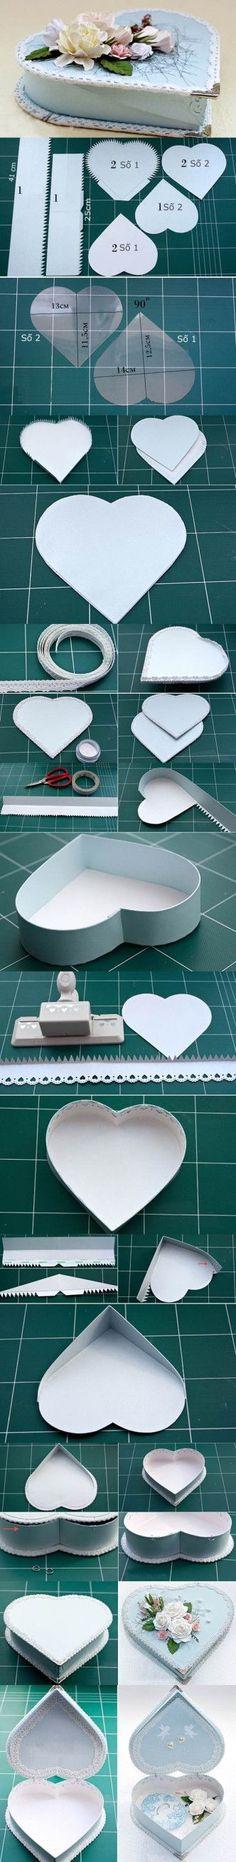 DIY Heart Shaped Gift Box 2